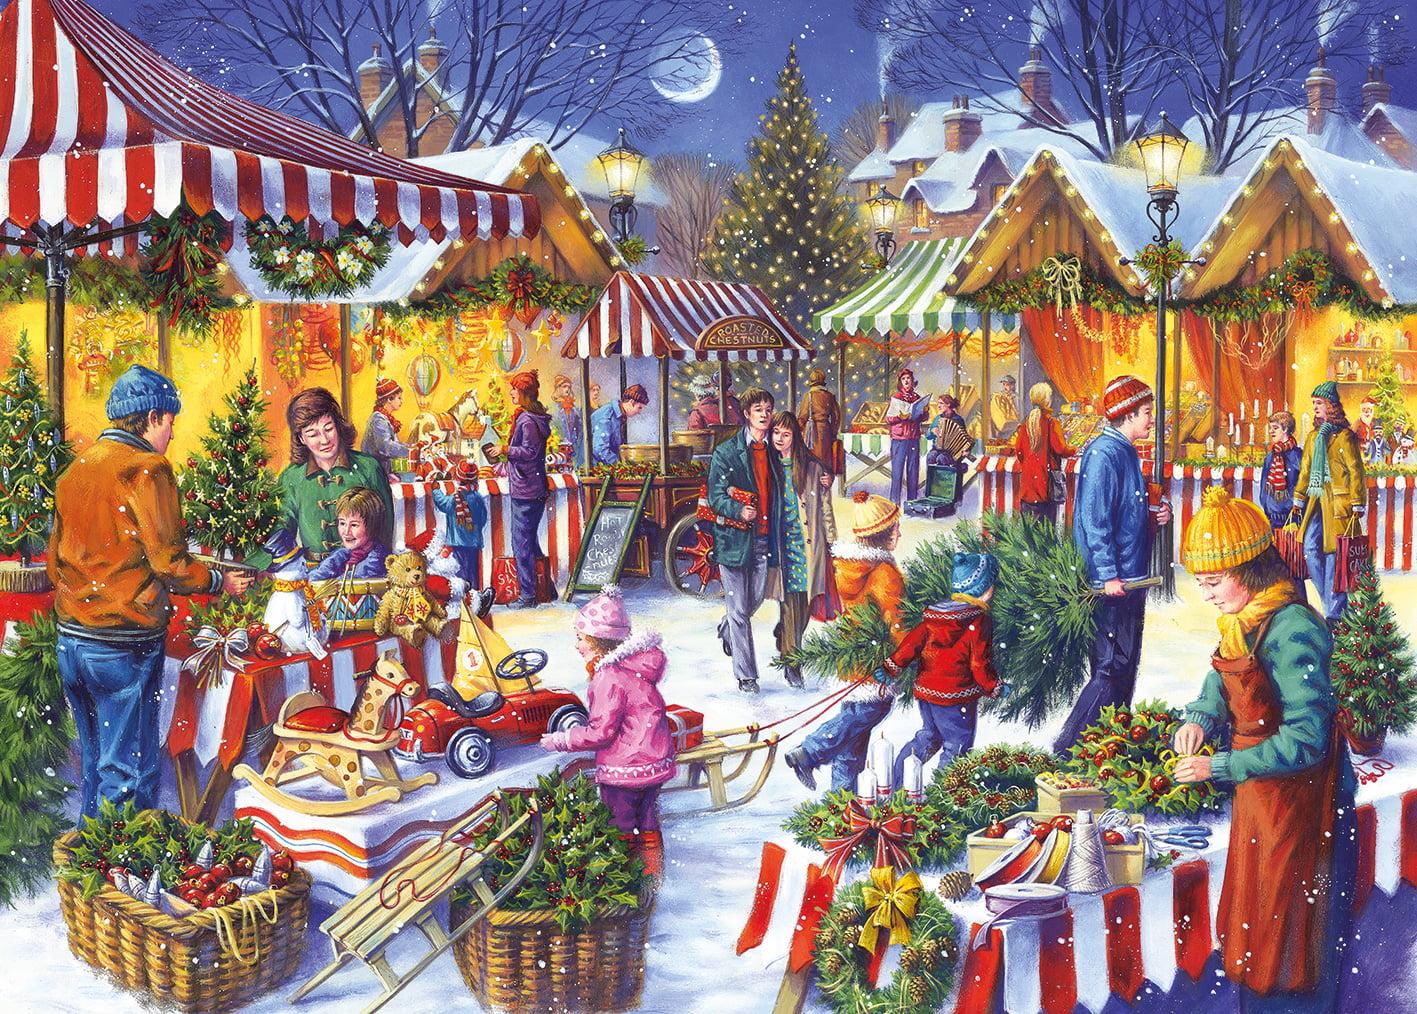 Christmas Fayre By Tony Ryan 1000 Piece Jigsaw Puzzle